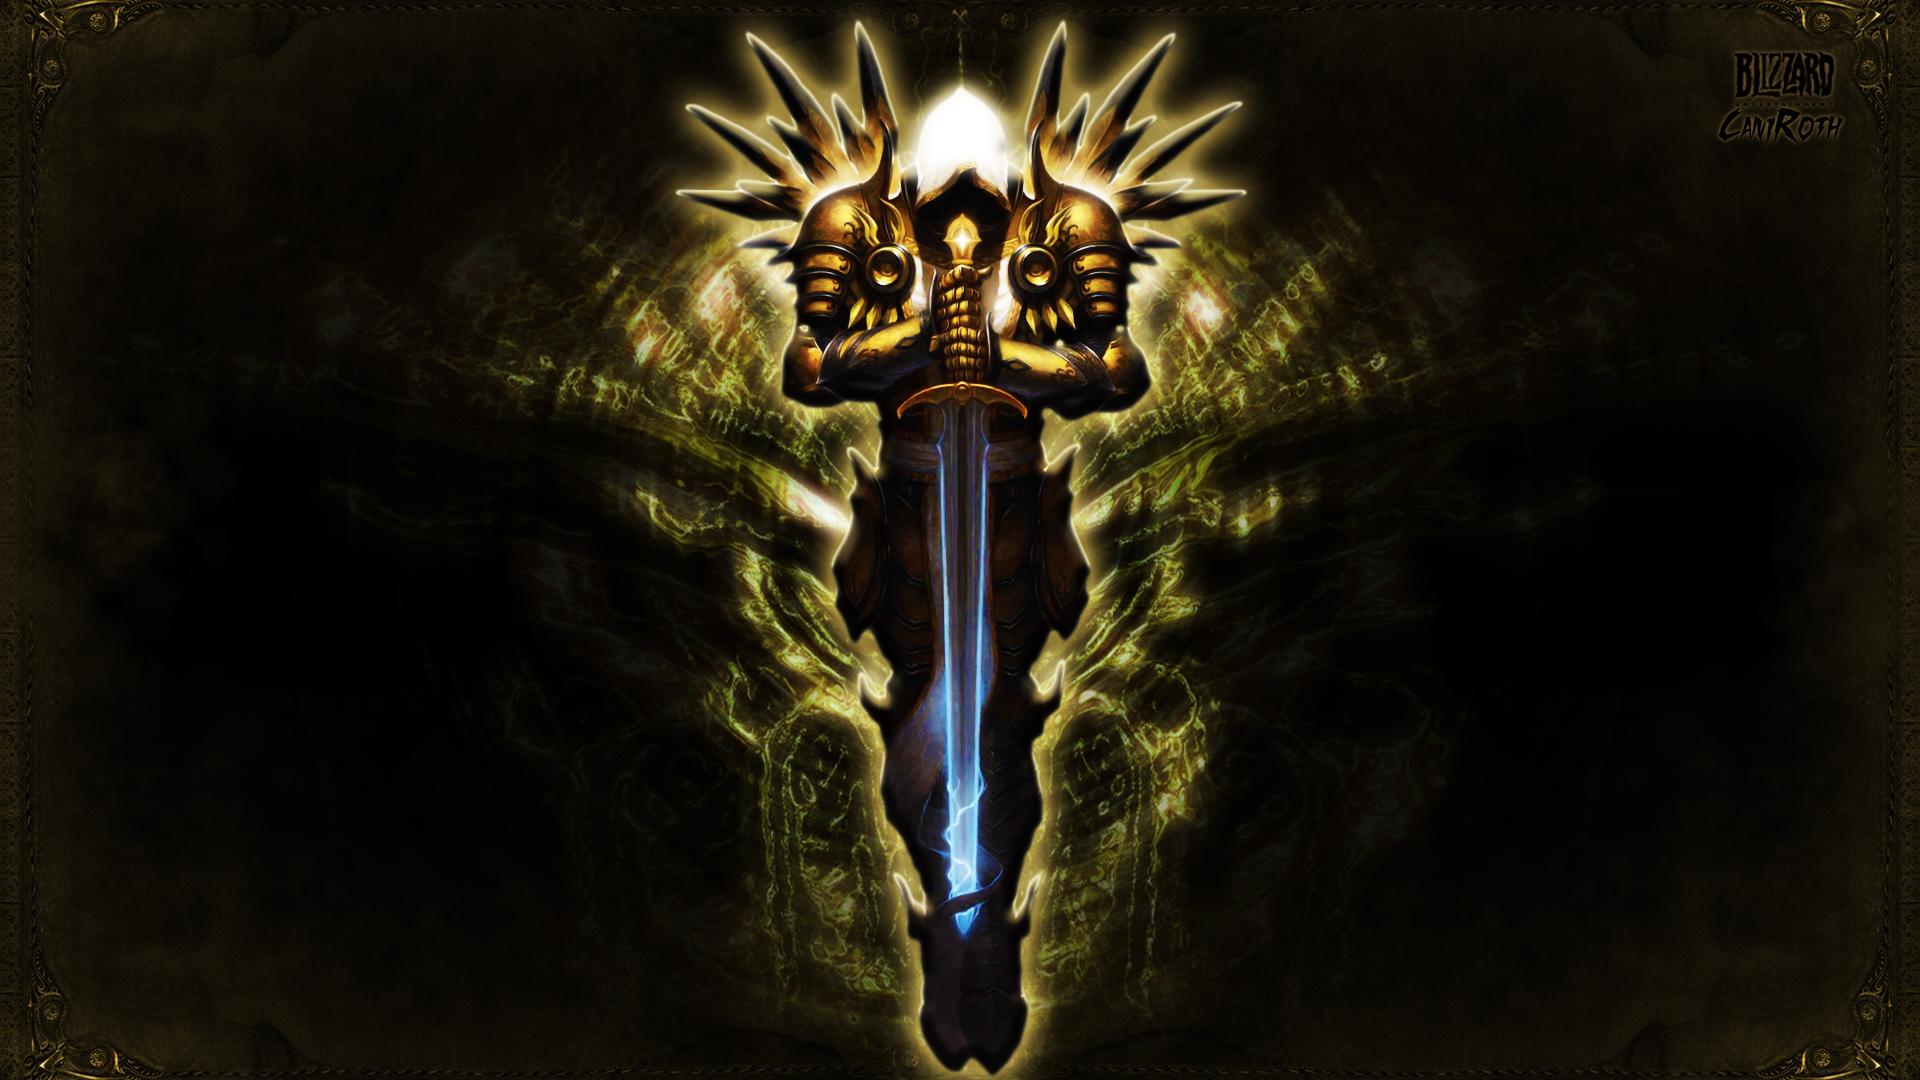 2012 Diablo 3 Tyrael Wallpapers - HD Wallpapers 98151